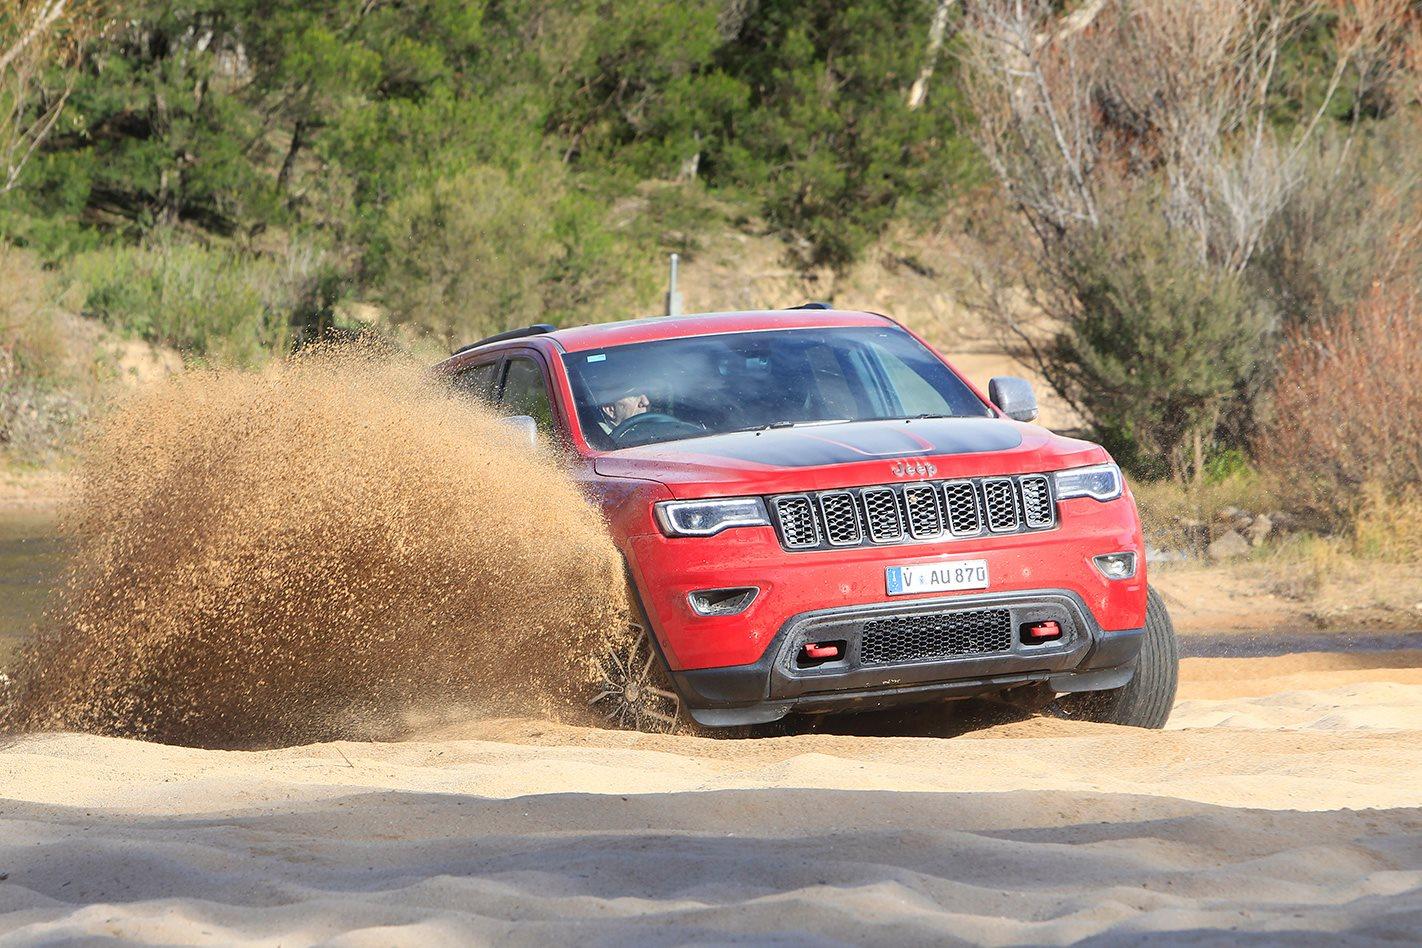 2017 Jeep Grand Cherokee Trailhawk driving on sand.jpg